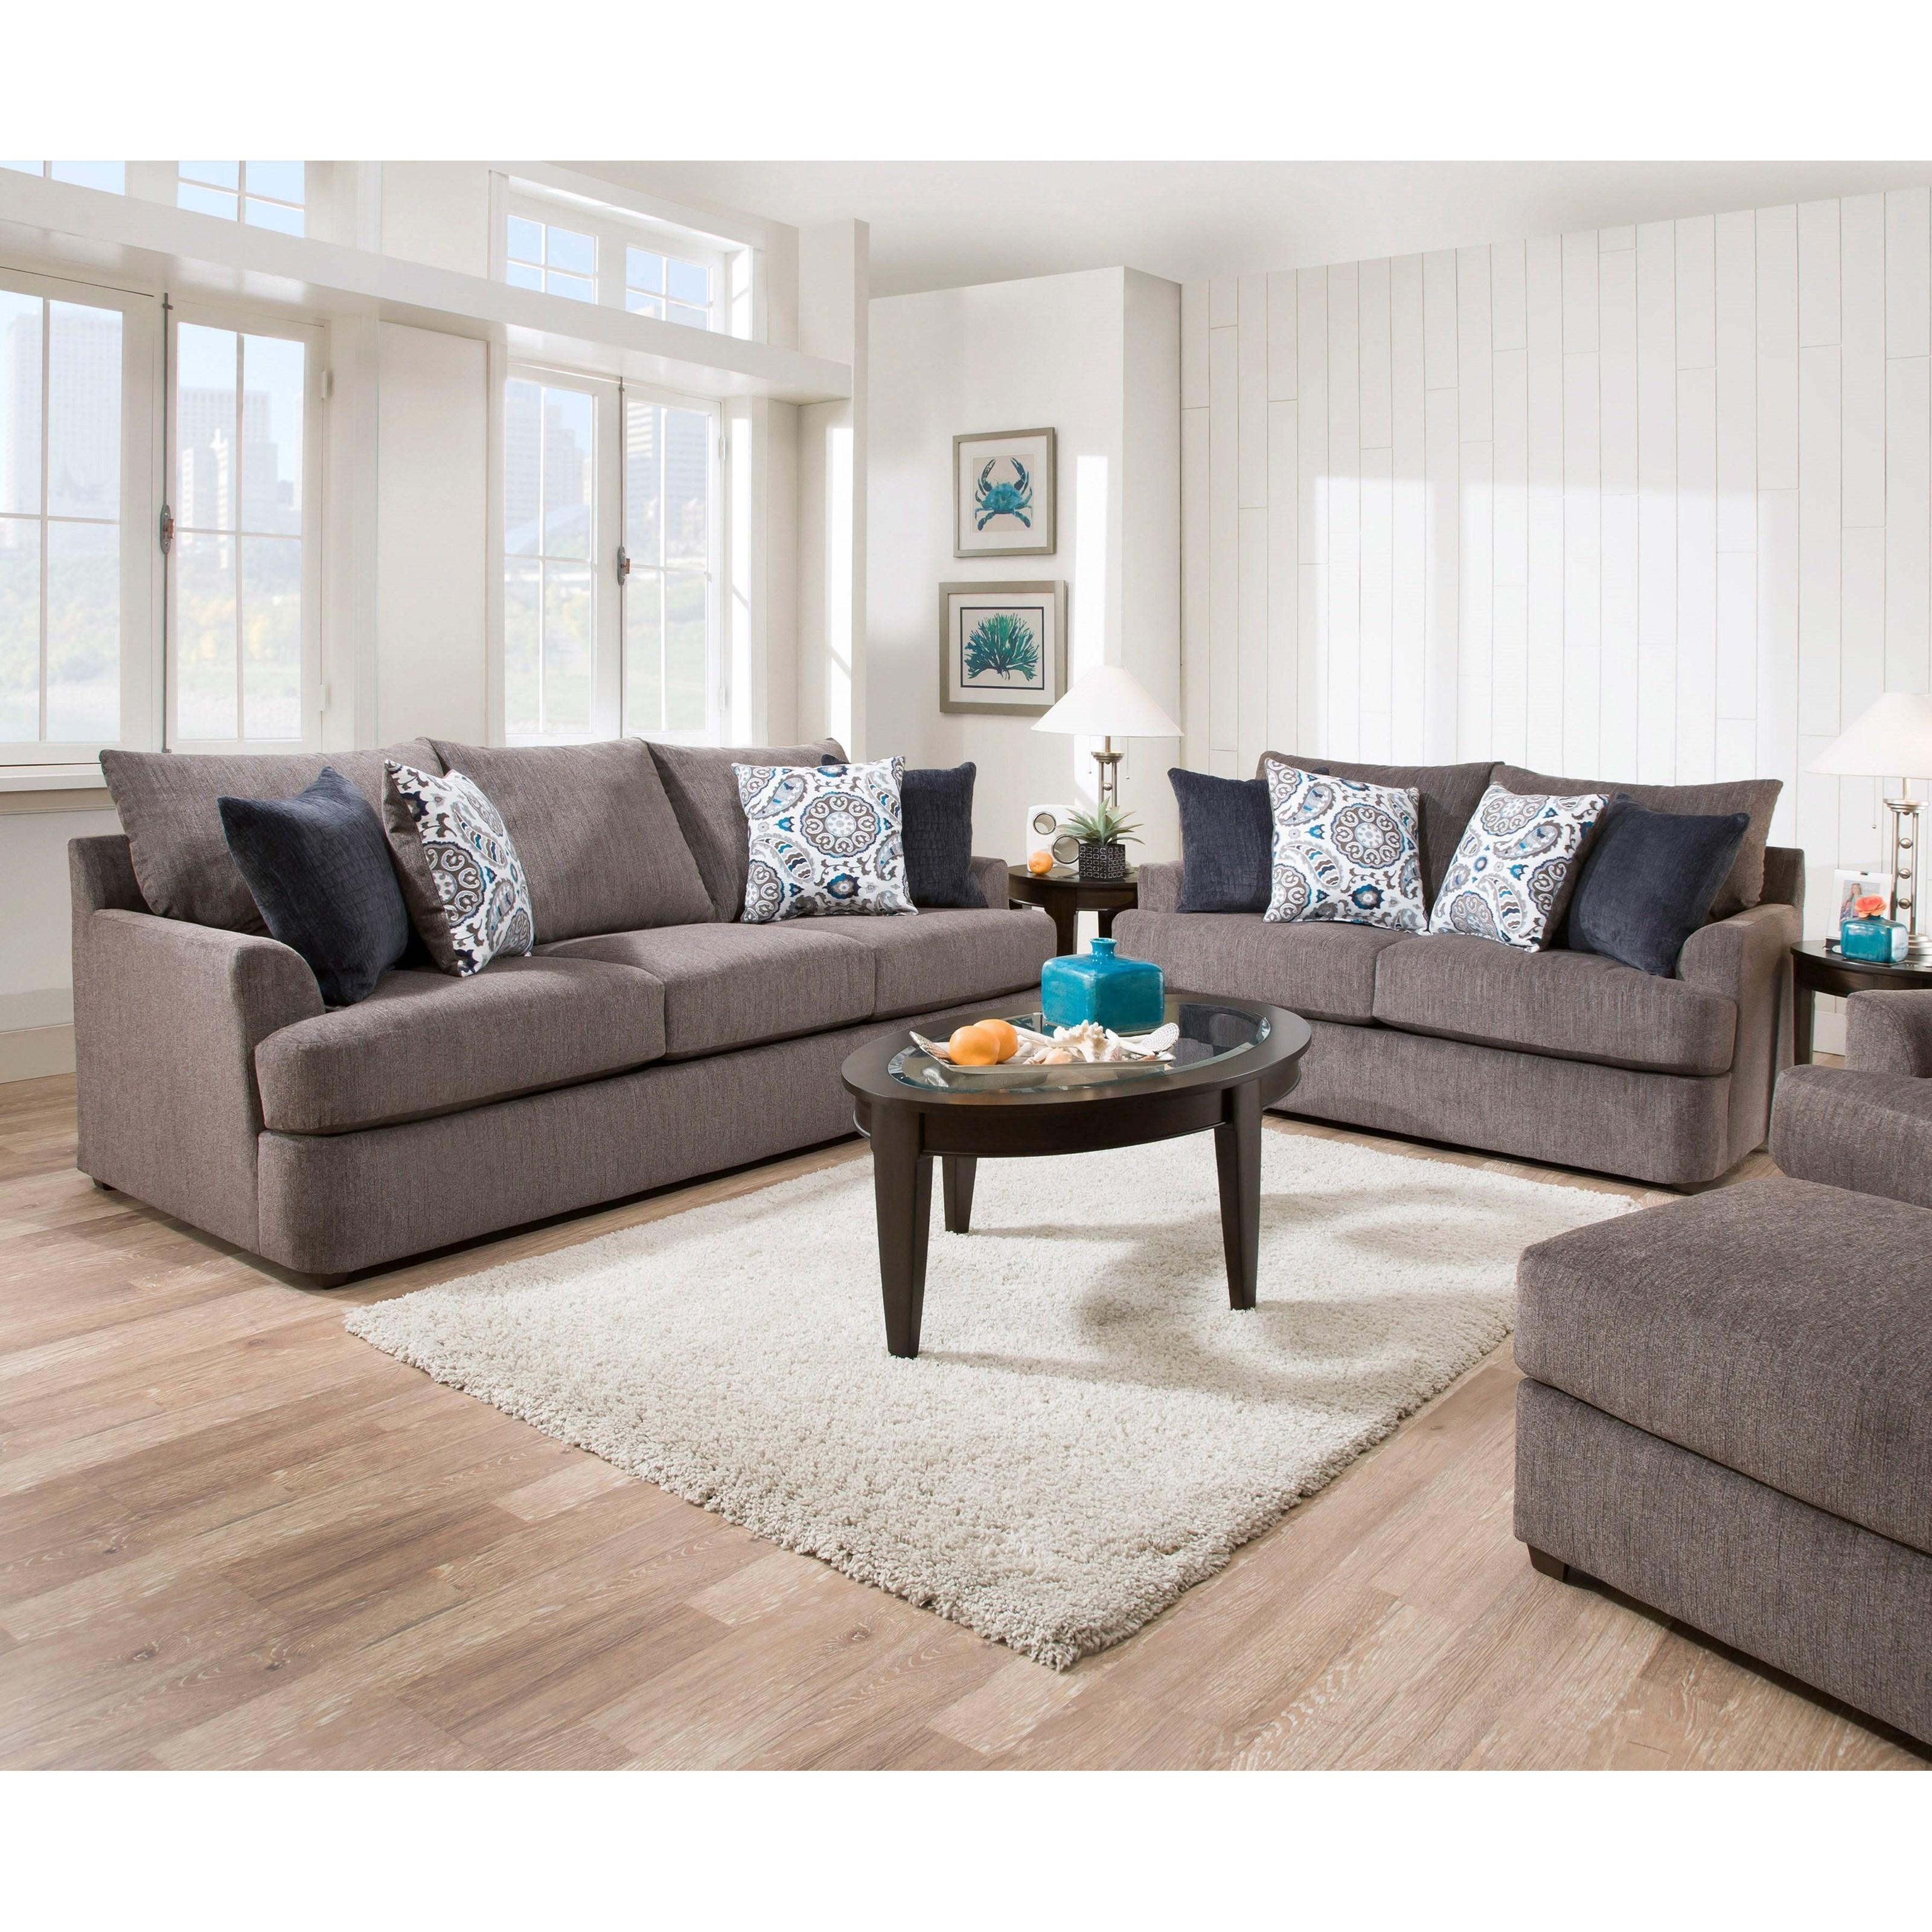 United Furniture Industries 1720 Sofa: United Furniture Industries 8540BR 8540BRSOFA Casual Sofa